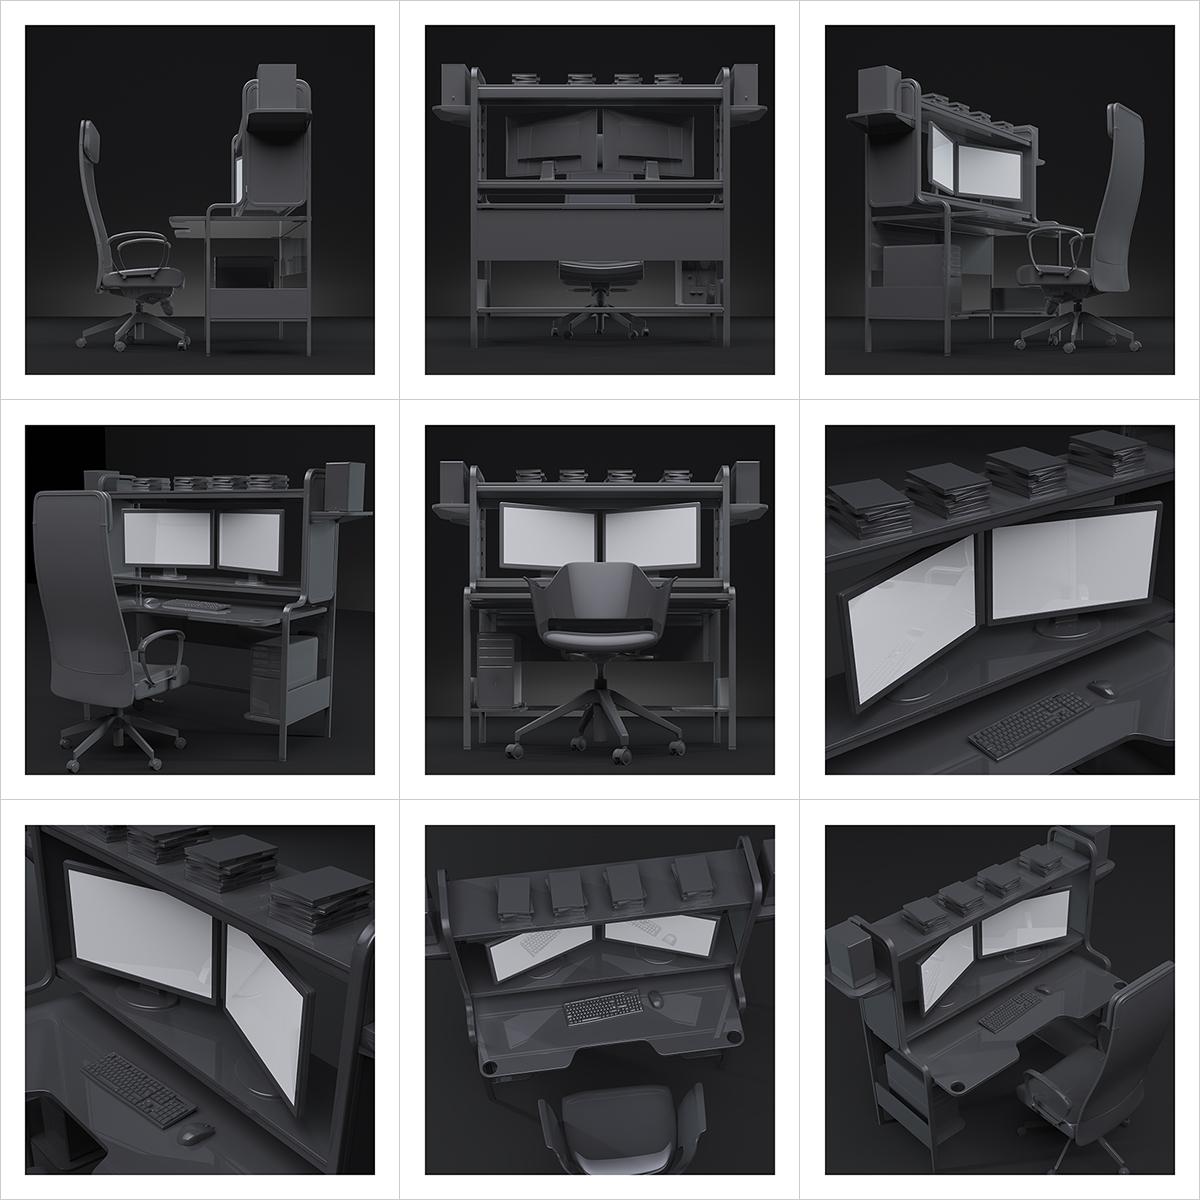 245 An artists studio I 000 - 2021 - An artist's studio in the 21st Century. I